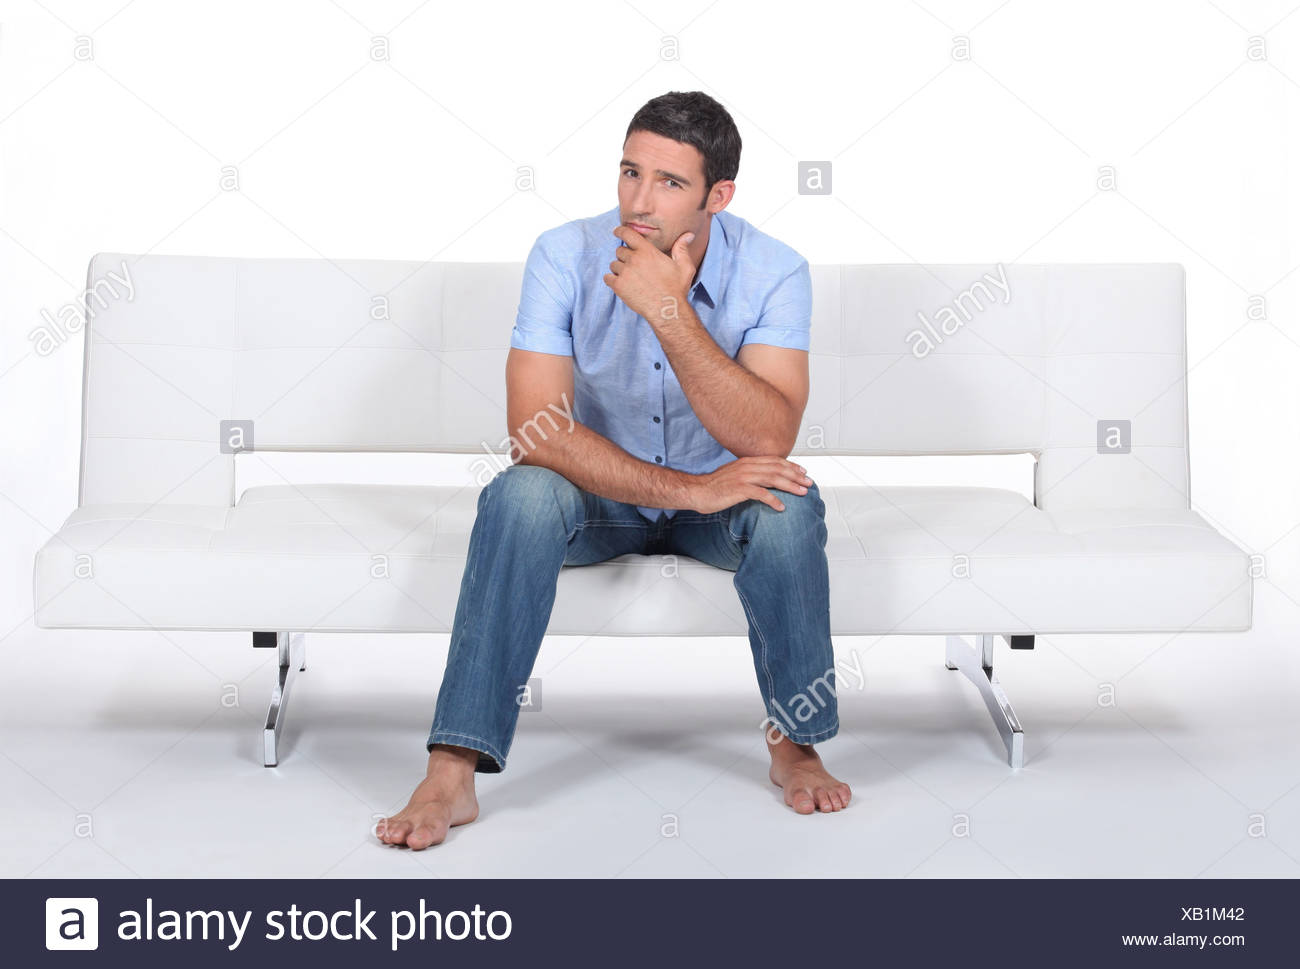 Man sitting on a sofa - Stock Image